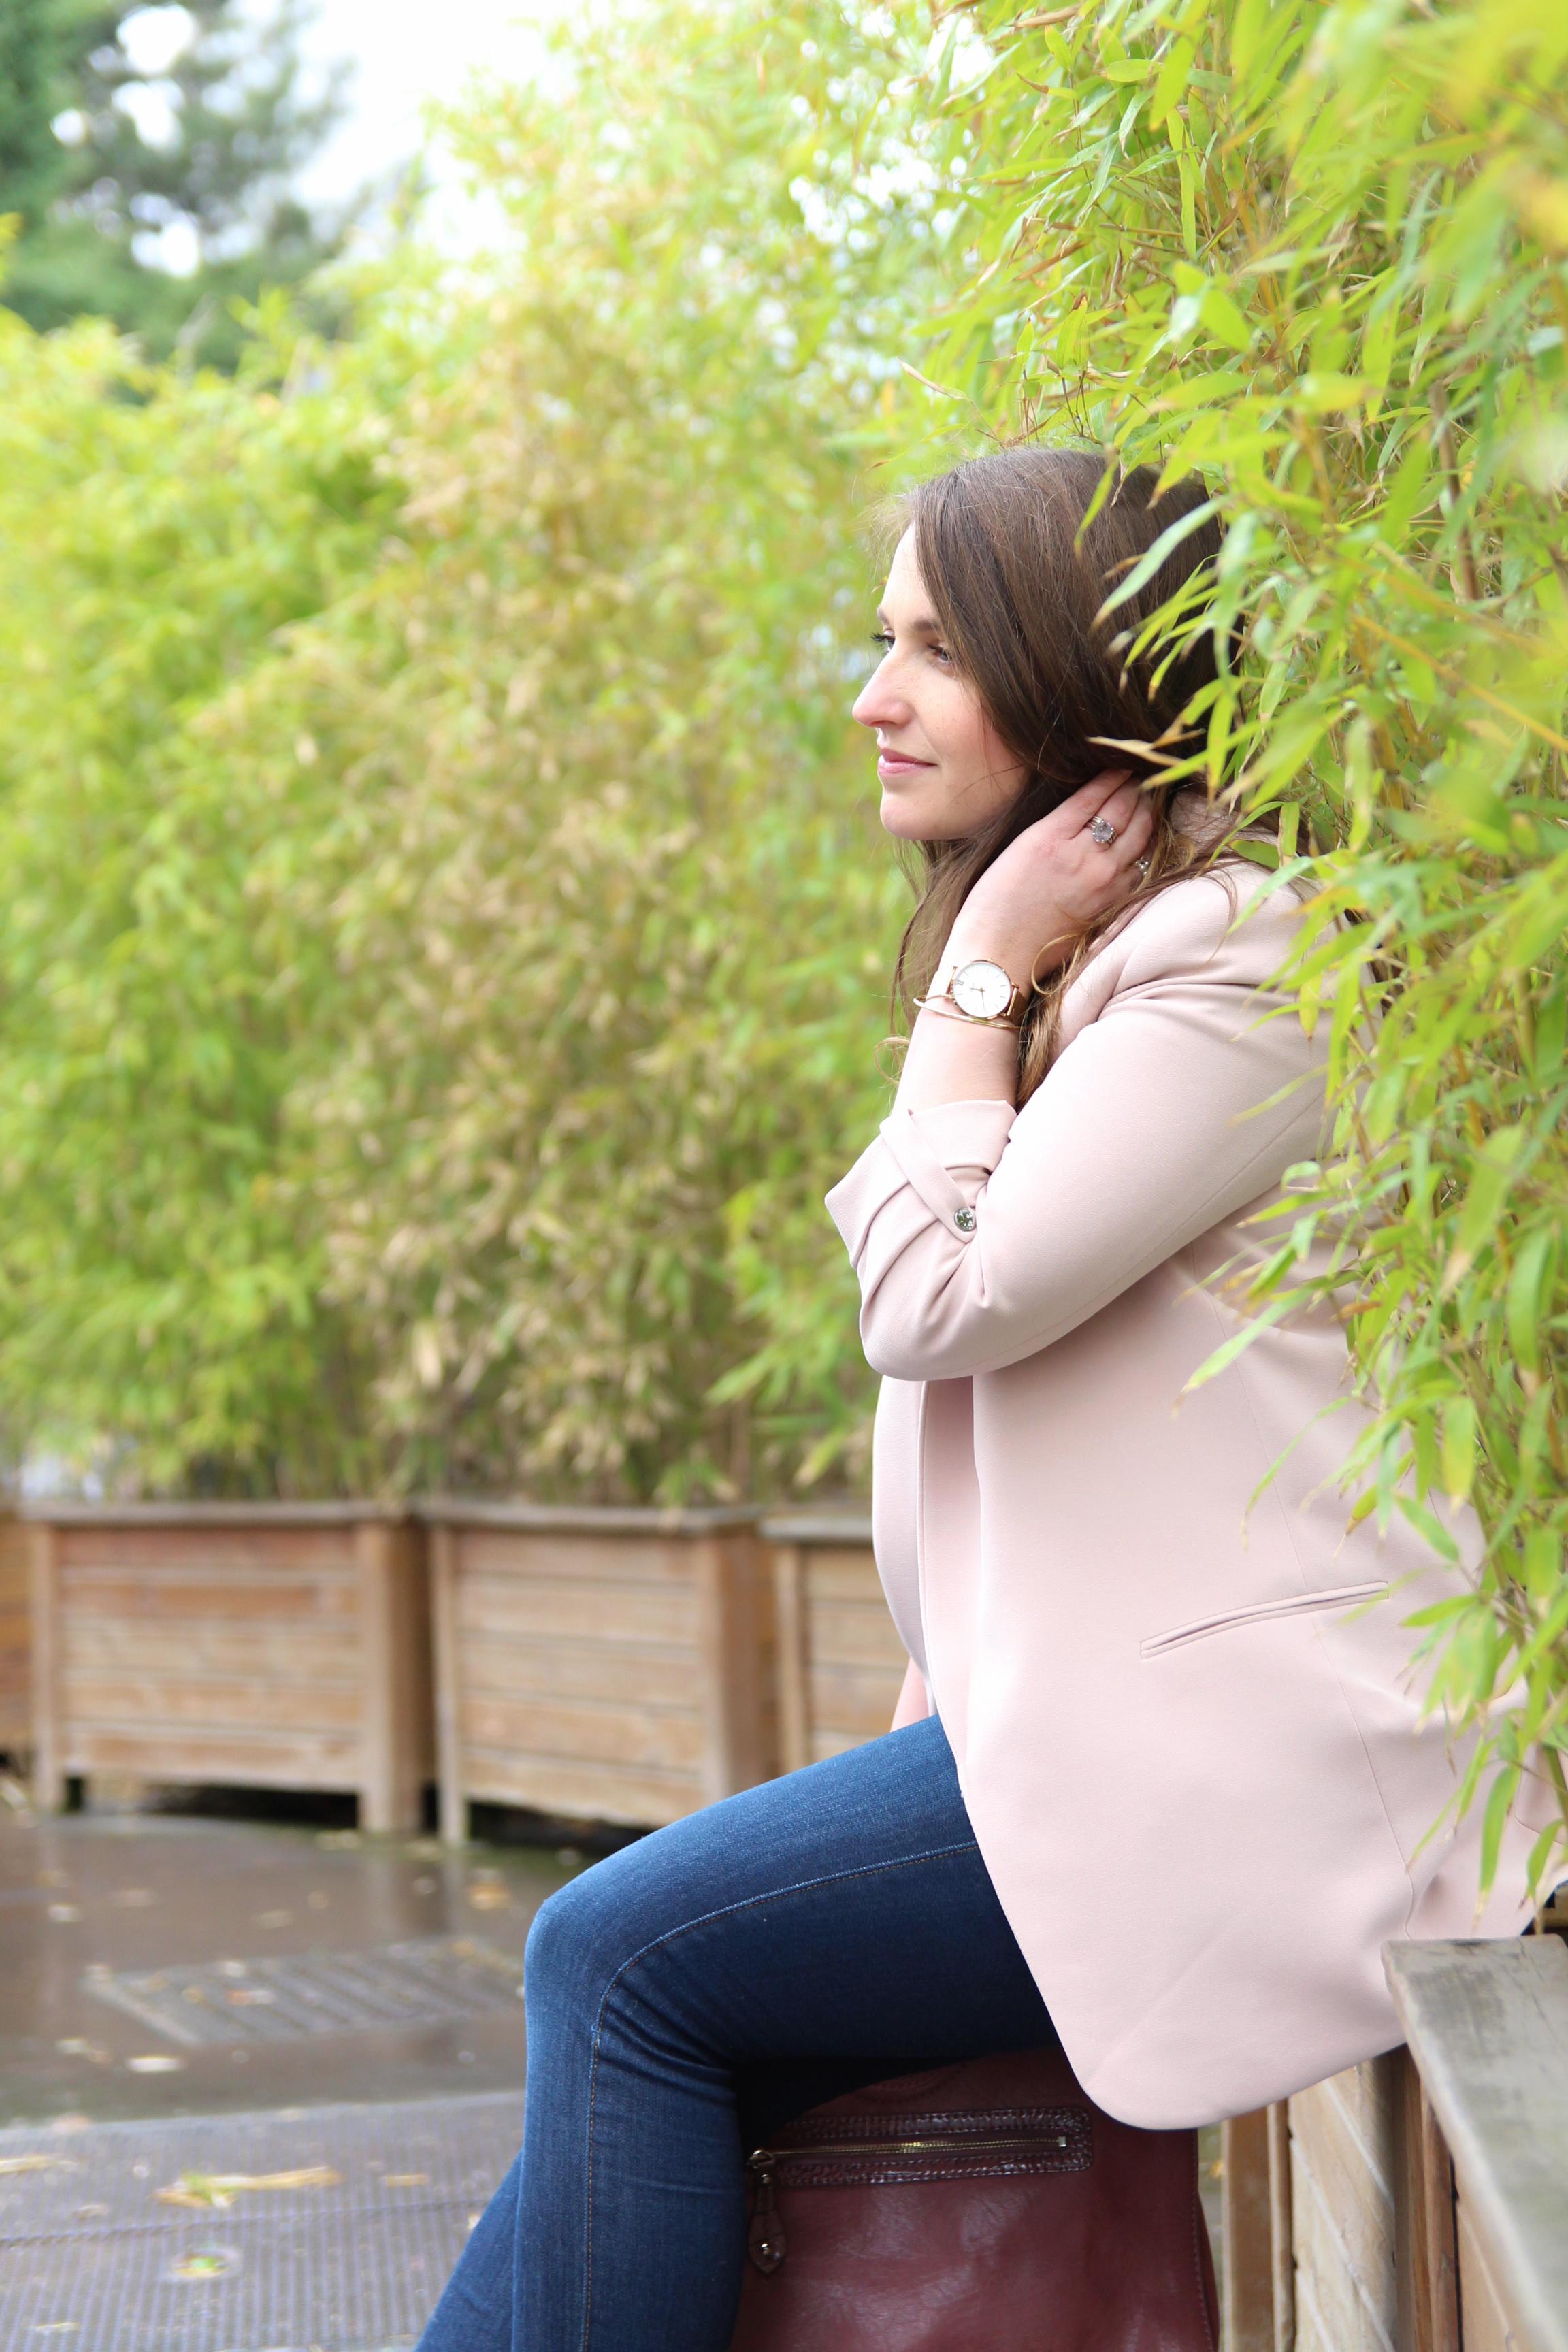 fashionblogger-influencer-jacket-zara-rosepastel-paris-seralynepointcom-2017-03-21 114716